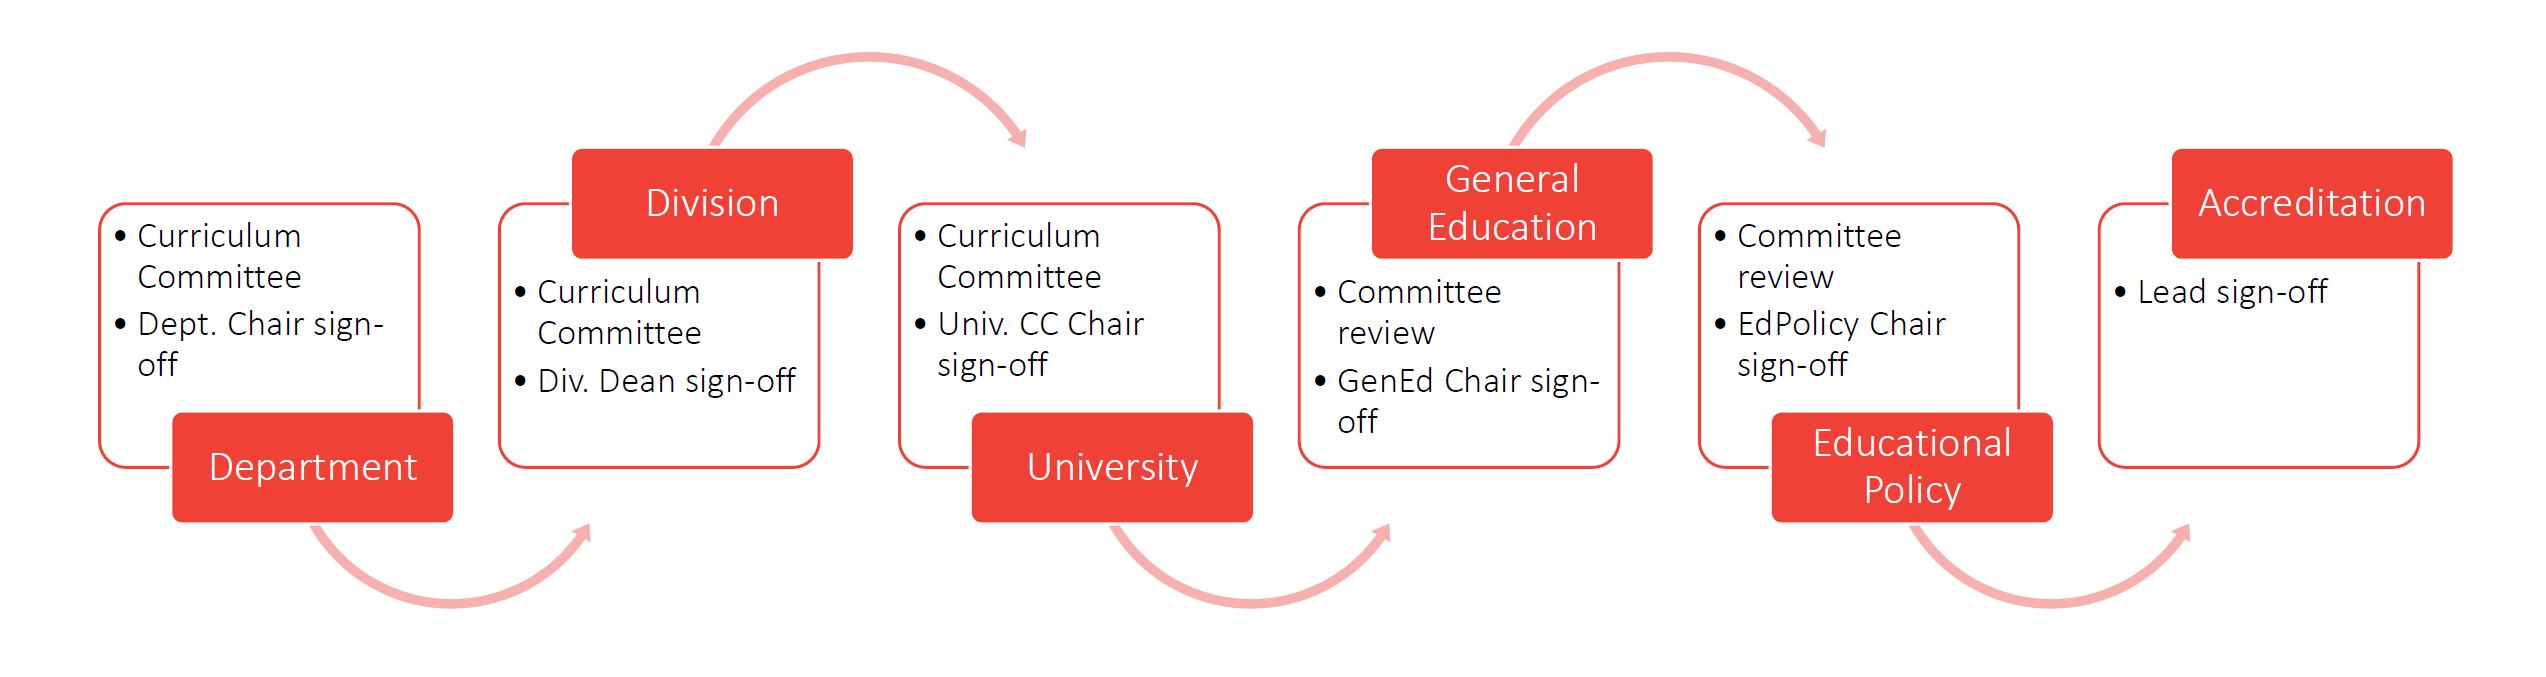 Curriculum process before